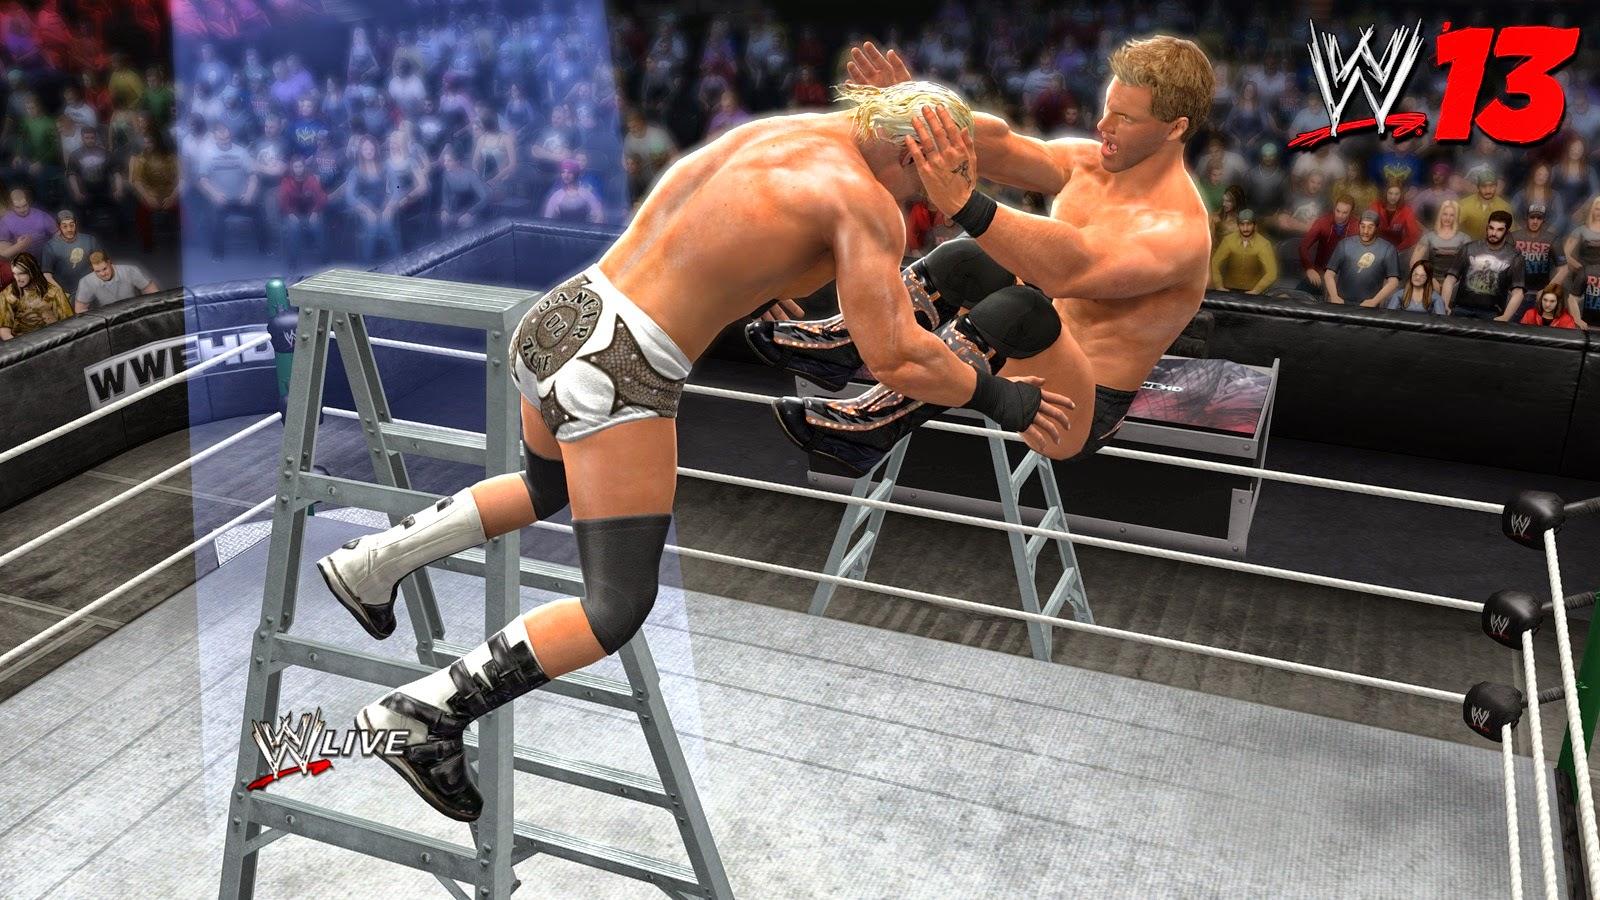 WWE Games - Play WWE Online Games